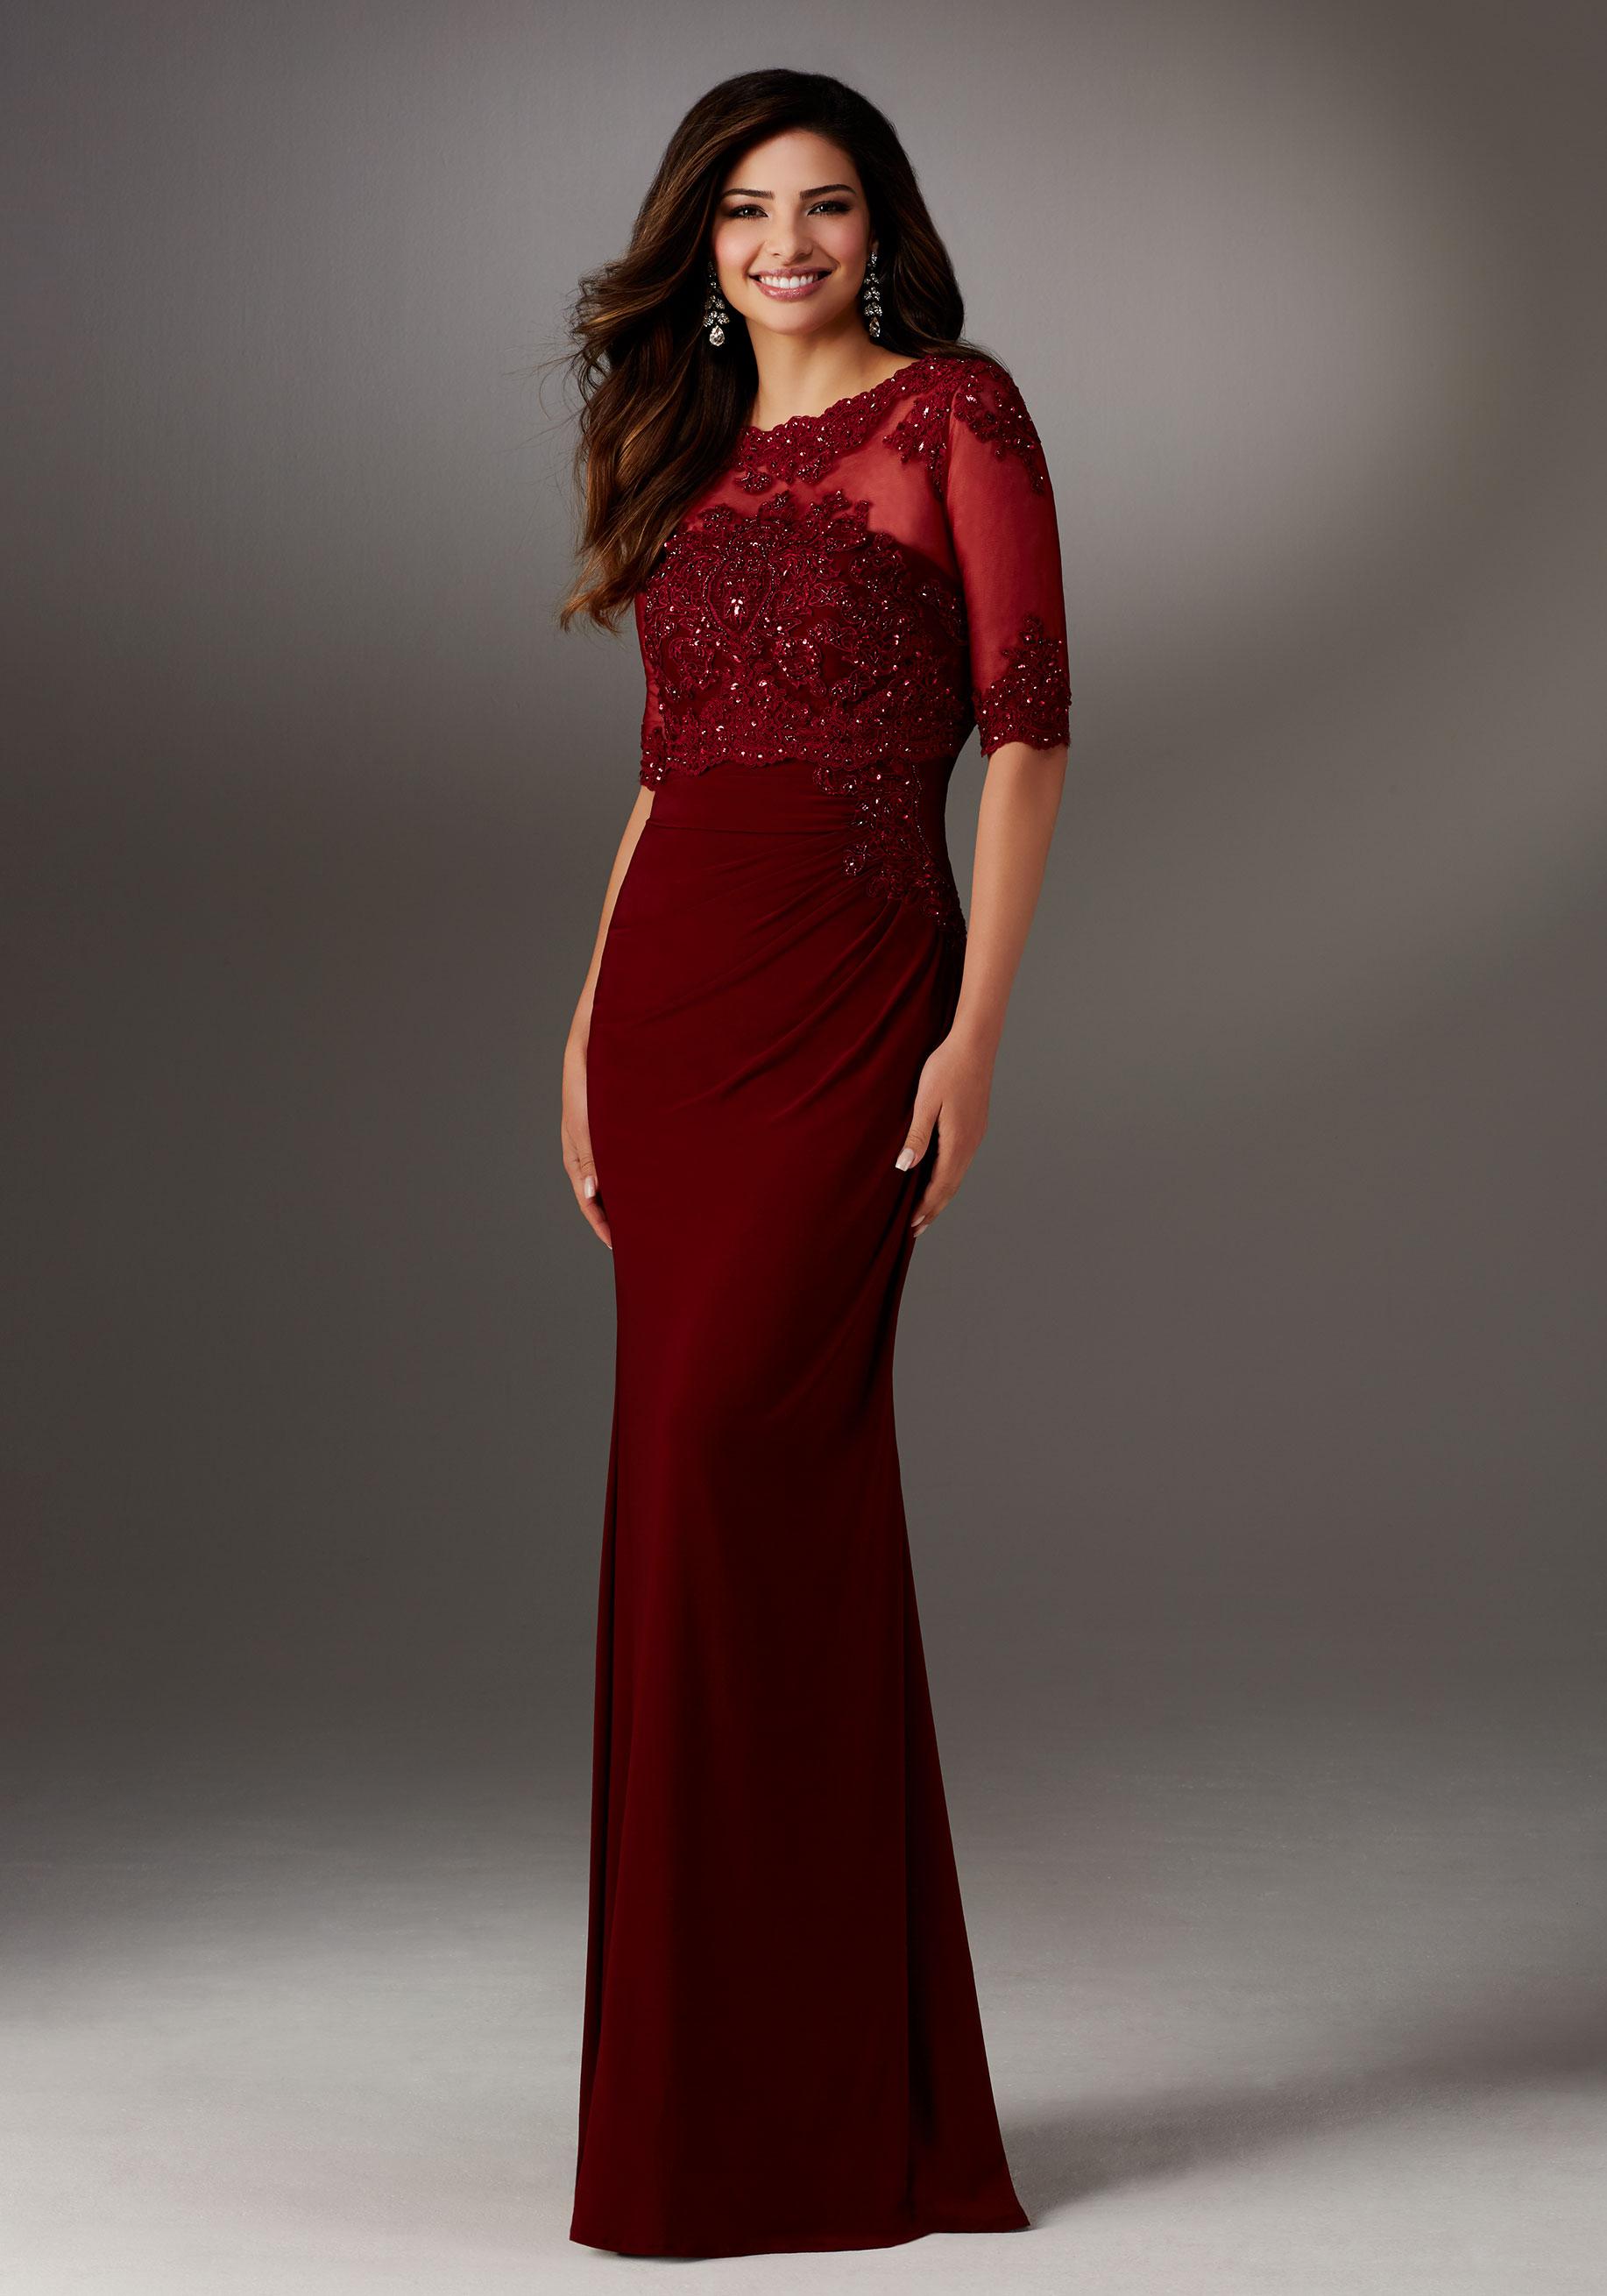 Mori Lee SKU 71510 - VeLace Bridal - Wedding Dresses Bellingham MA